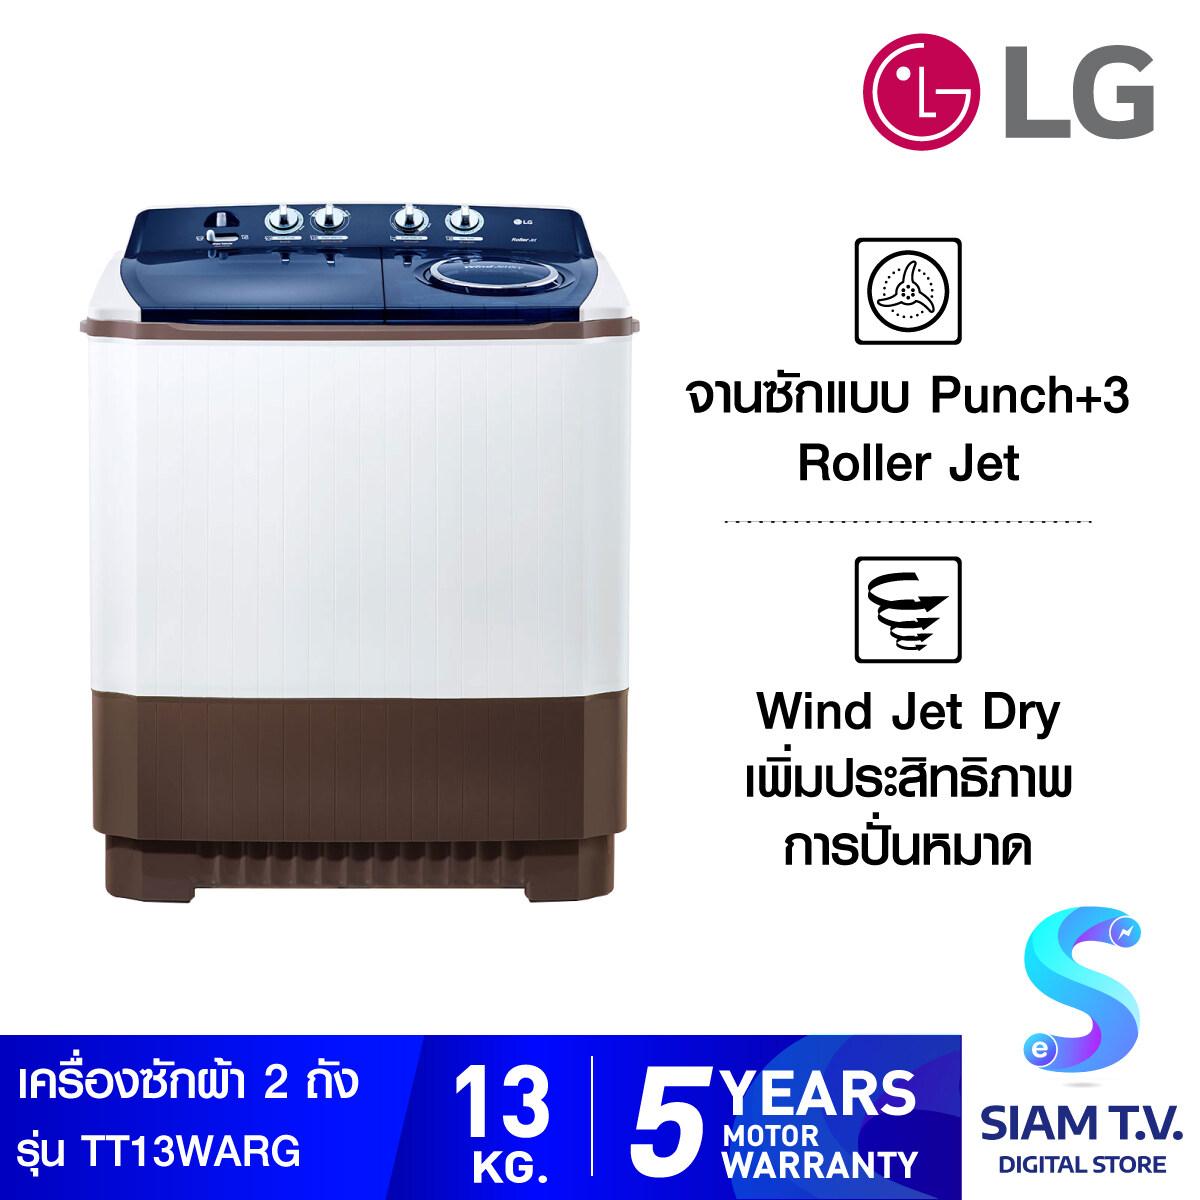 LG เครื่องซักผ้า 2 ถัง ซัก 13 กก. รุ่น TT13WARG ระบบ Roller Jet โดย สยามทีวี by Siam T.V.